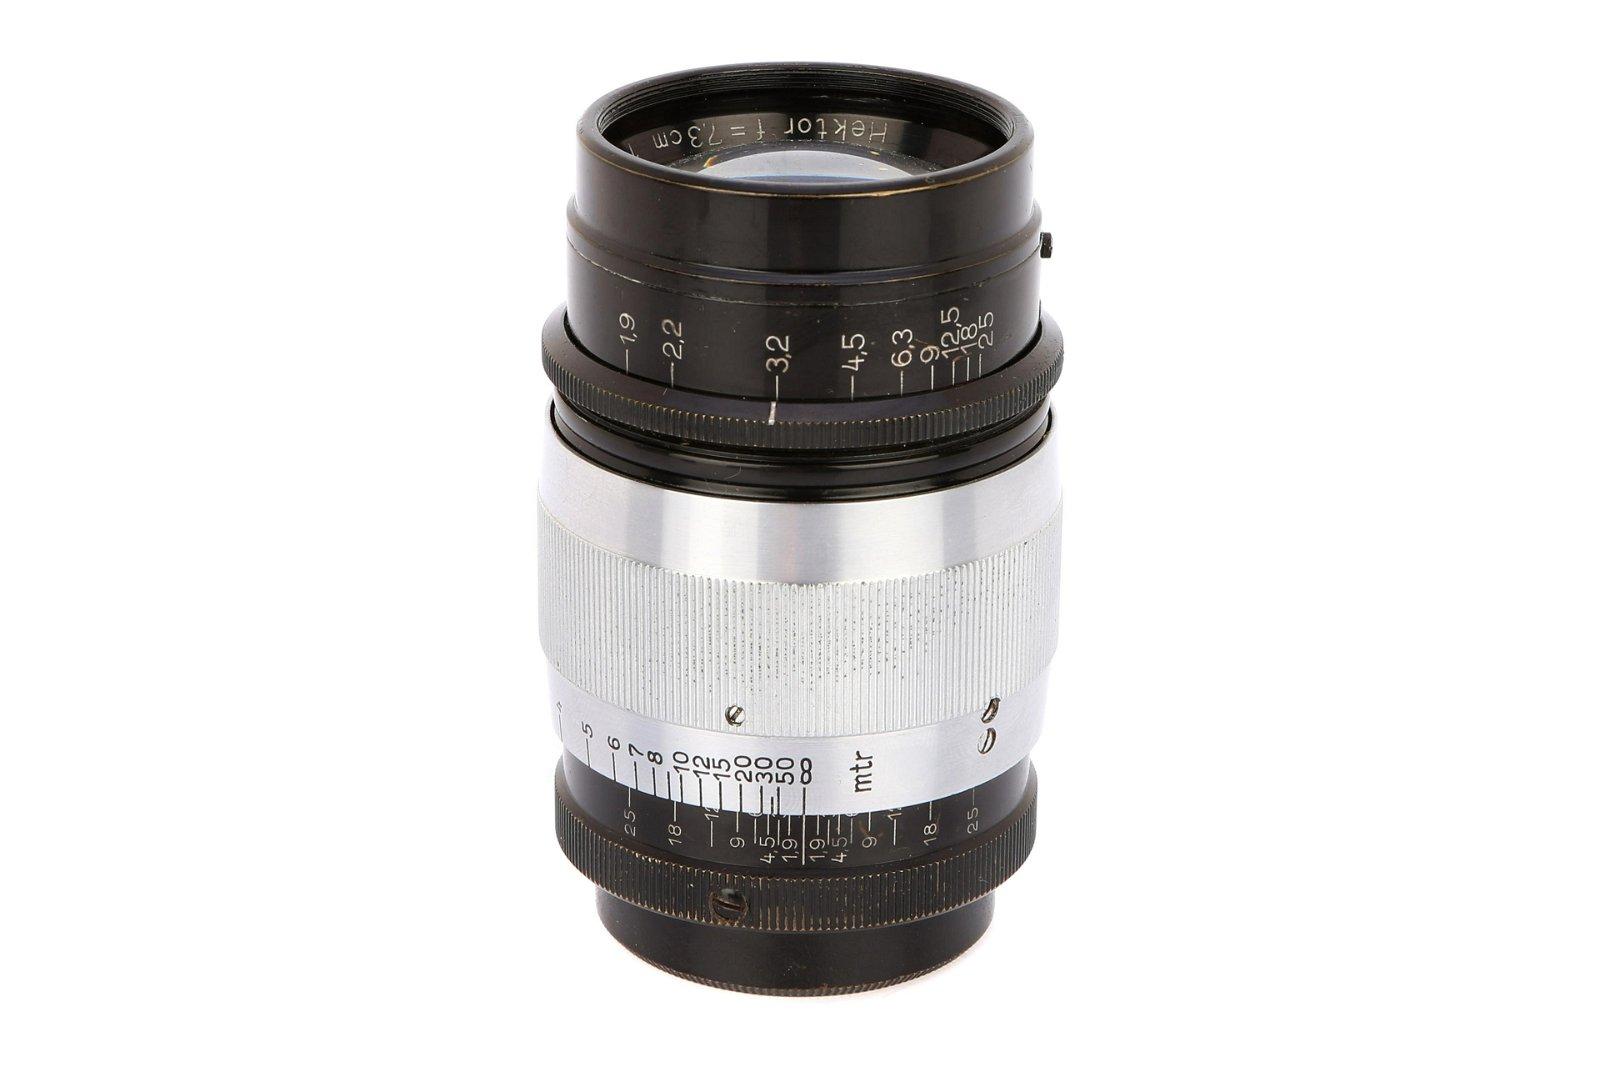 * A Leitz Hektor f/1.9 73mm Lens,